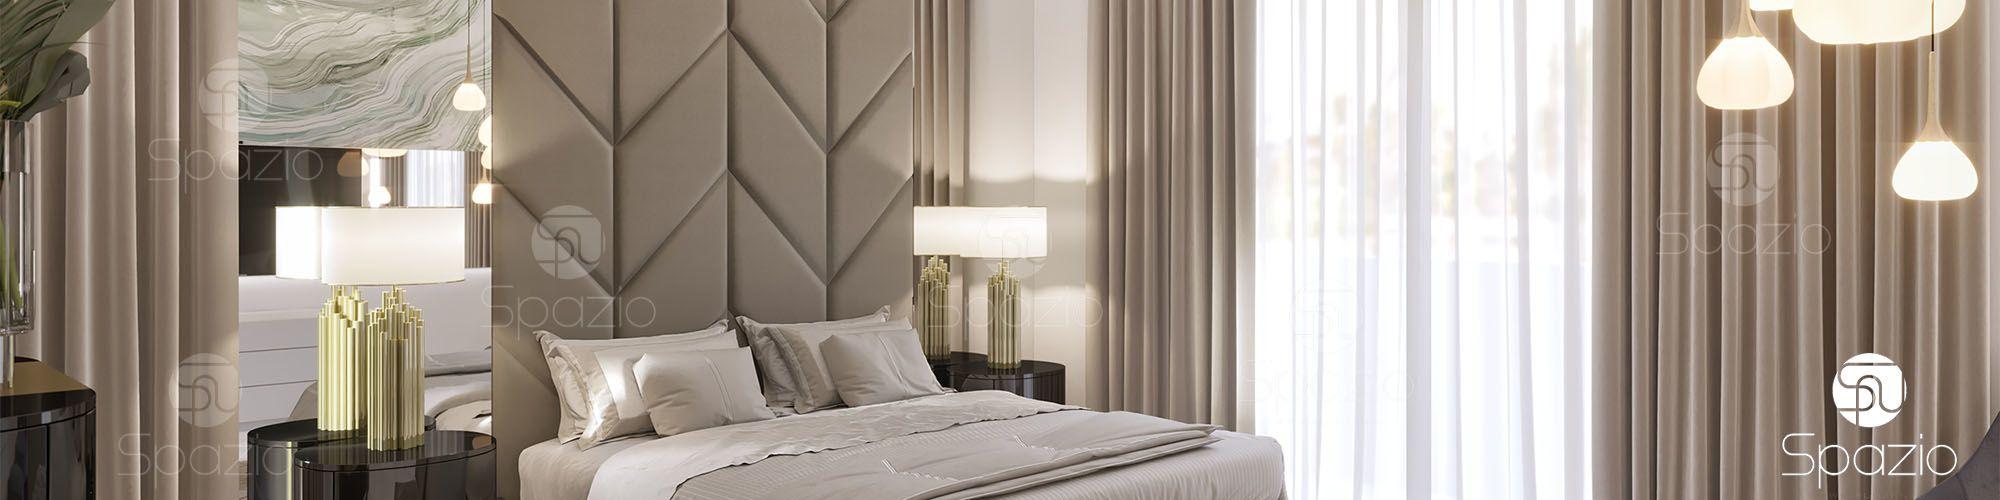 luxury dubai design for bedroom